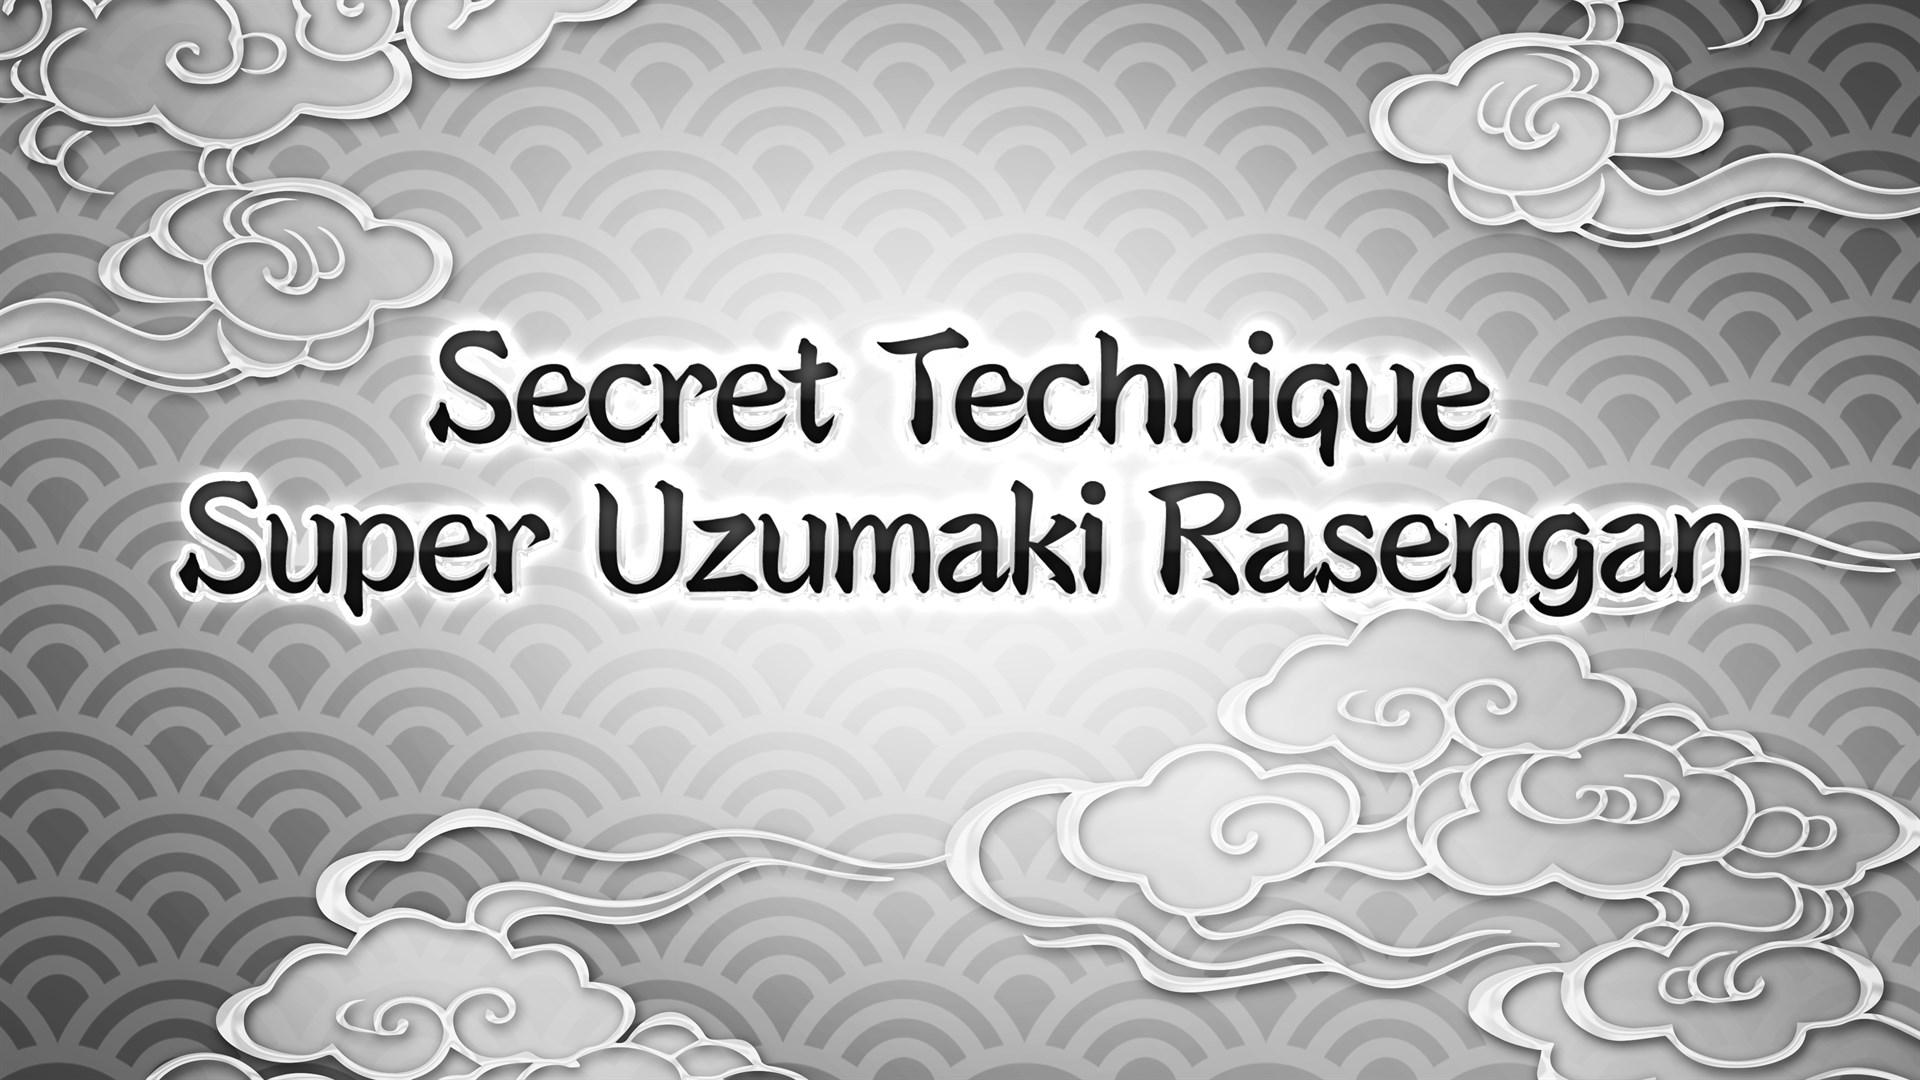 NARUTO TO BORUTO: SHINOBI STRIKER Secret Technique: Super Uzumaki Rasengan